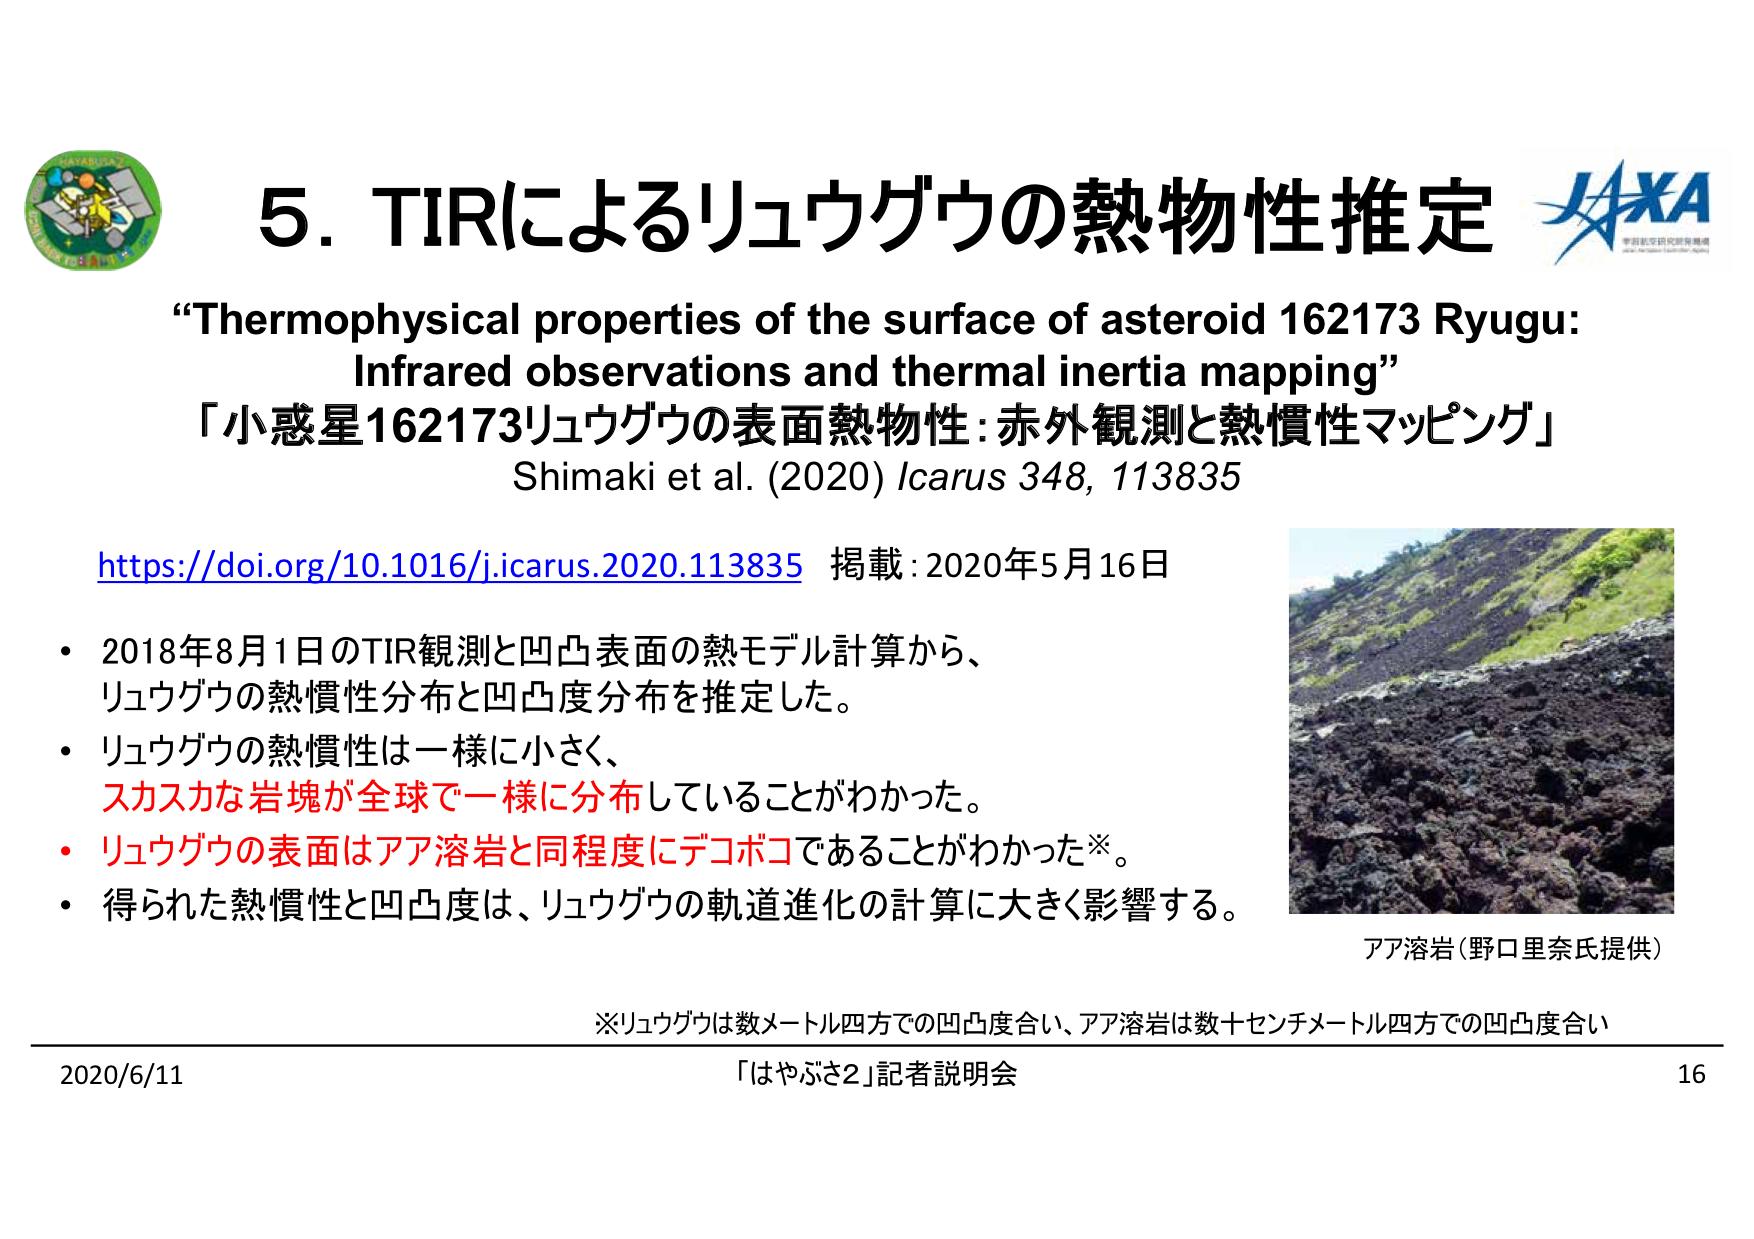 f:id:Imamura:20200611094619p:plain